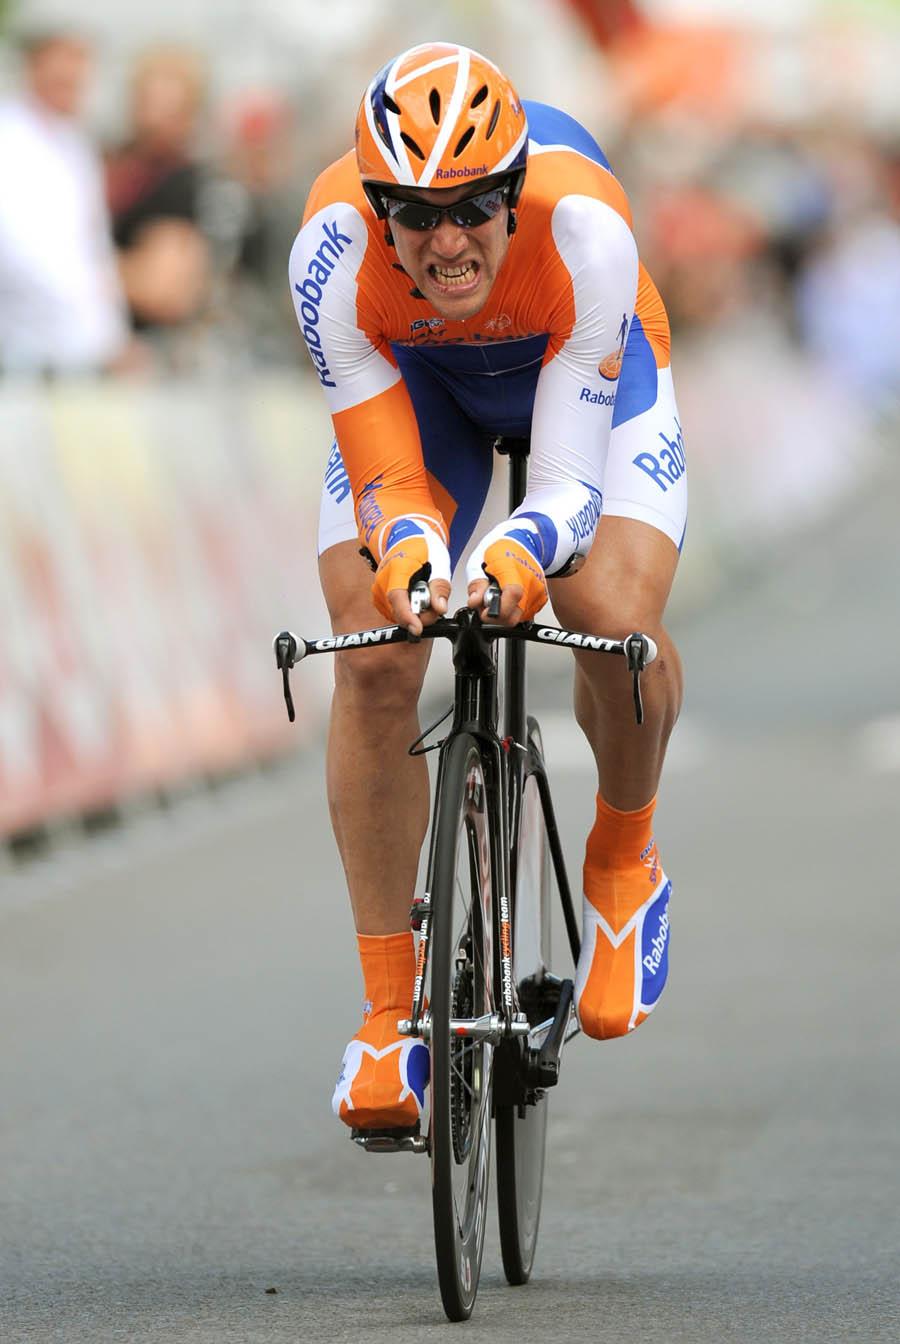 Maarten Tjallingi, Eneco Tour 2010, stage 7 ITT